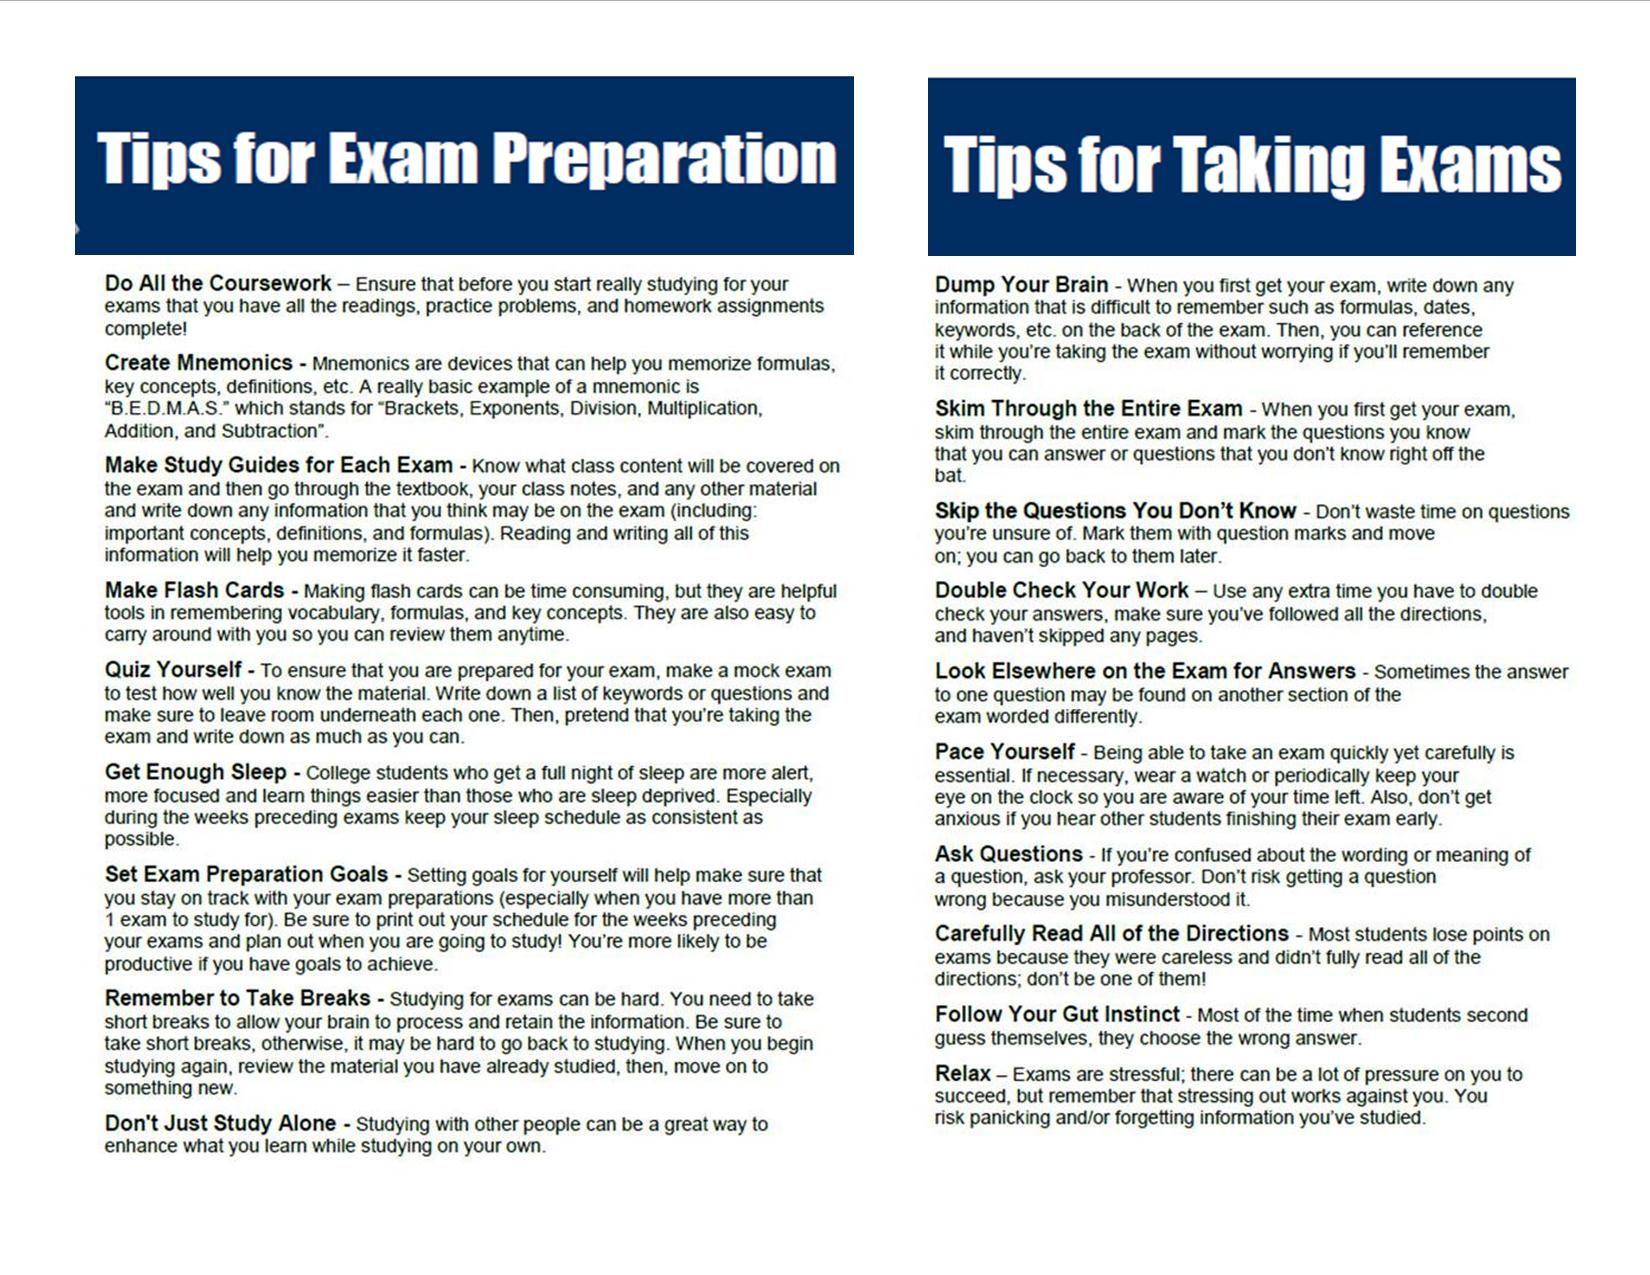 Buy Essay Exams Tips Exam Preparation Tips Take Exam